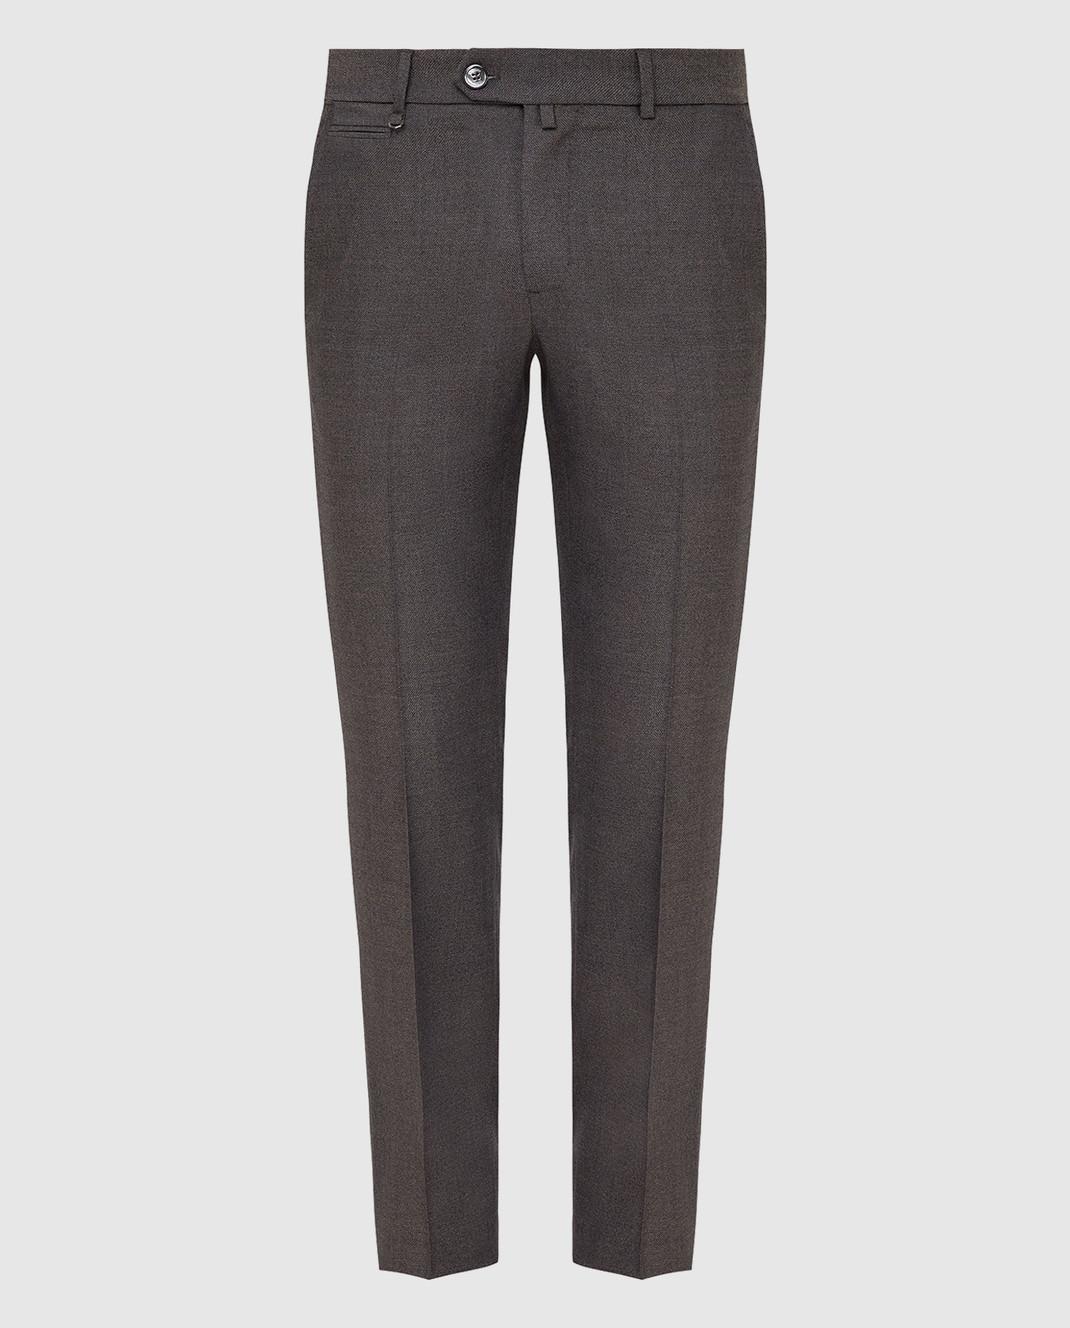 Stefano Ricci Темно-бежевые брюки из шерсти изображение 1